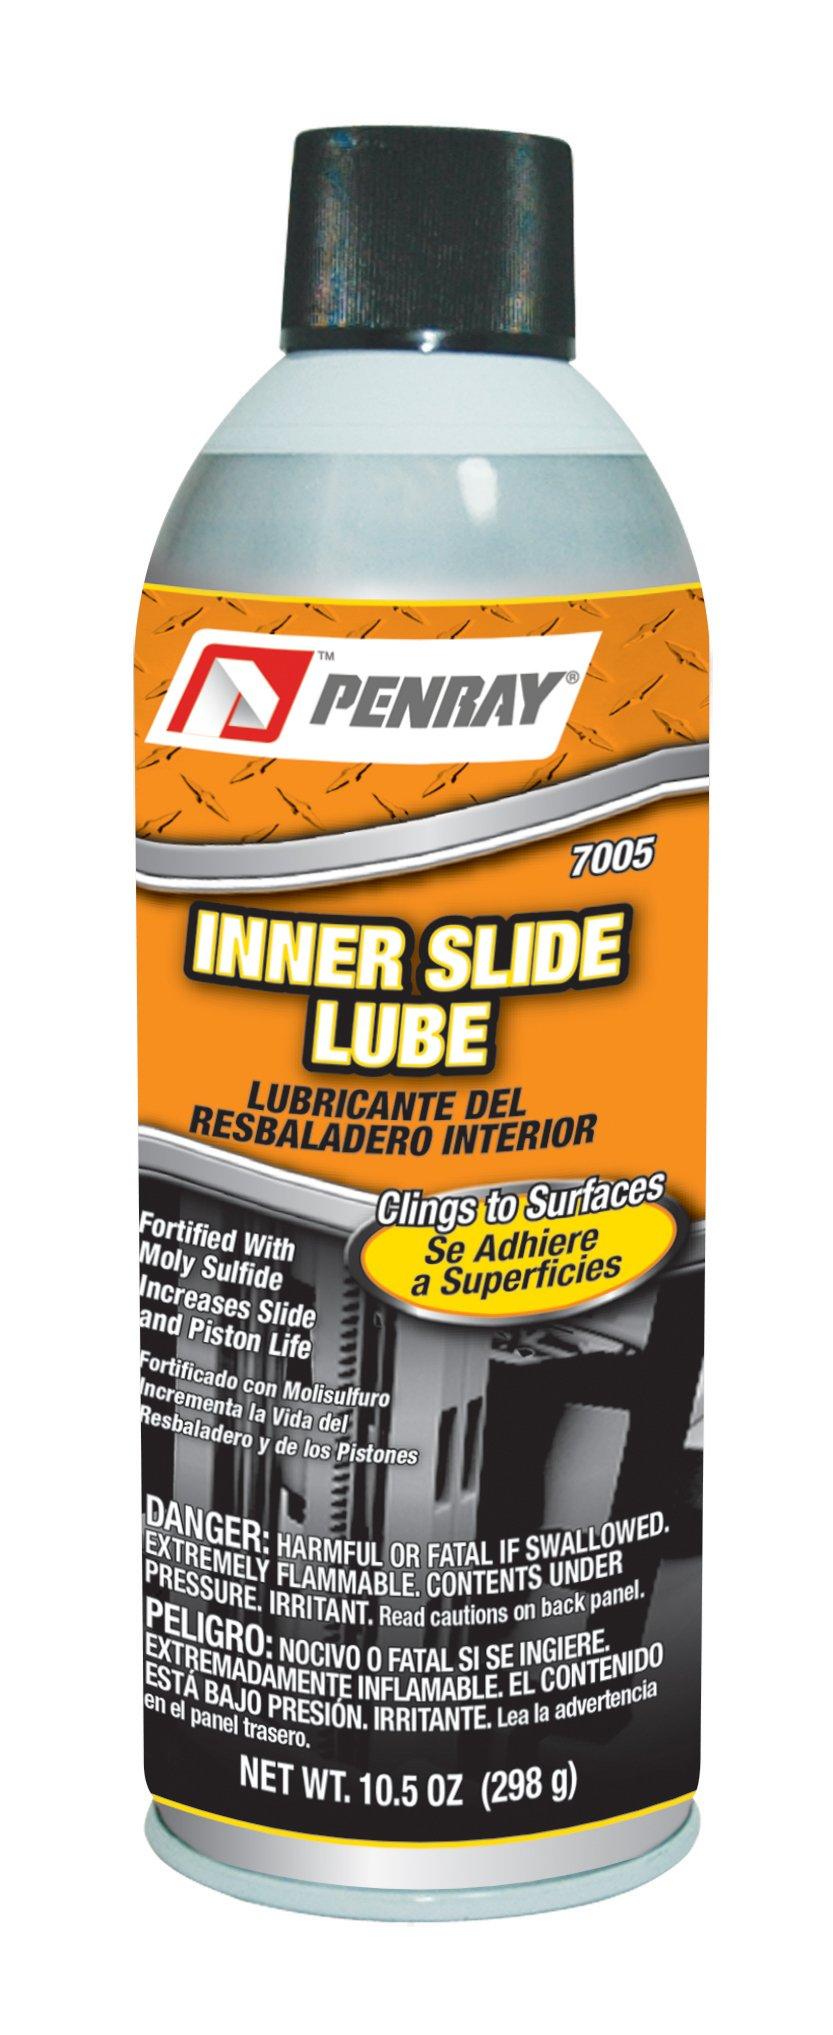 The Penray Companies Penray 7005 Inner Slide Lube - 10.5-Ounce Aerosol Can